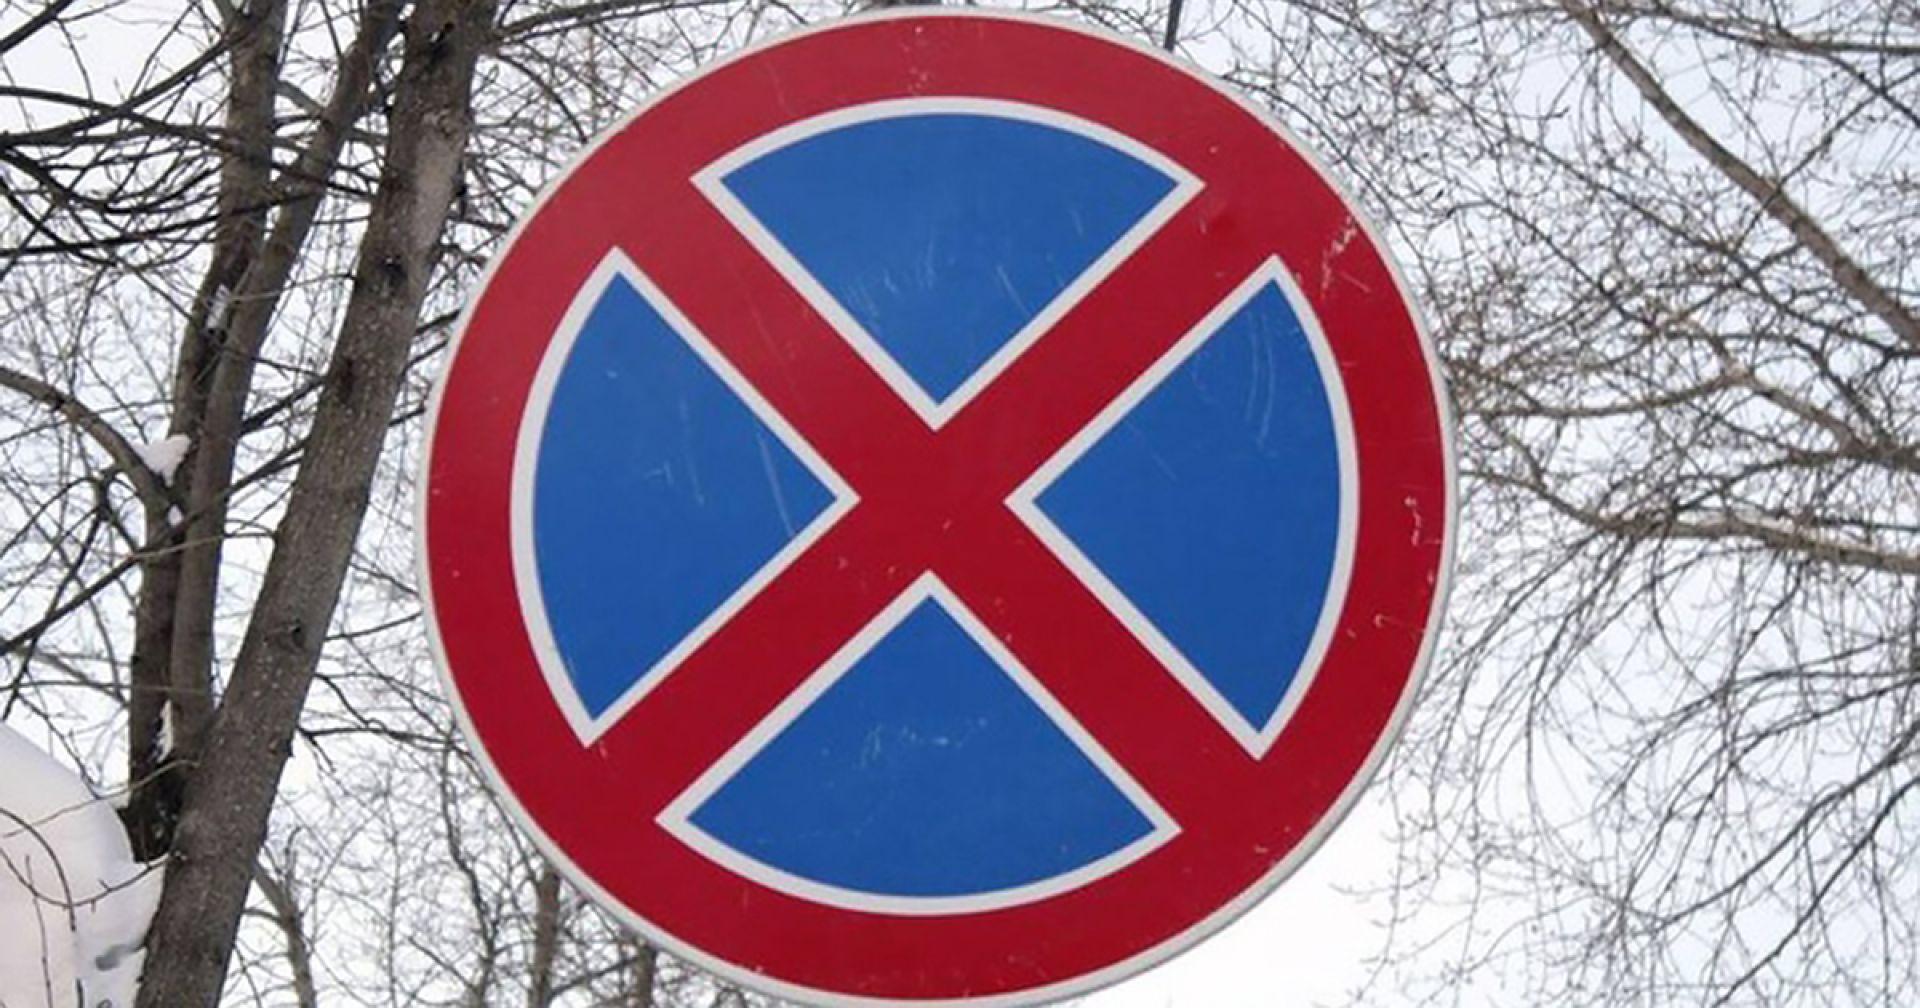 На улице Белинского ввели запрет на остановку транспорта